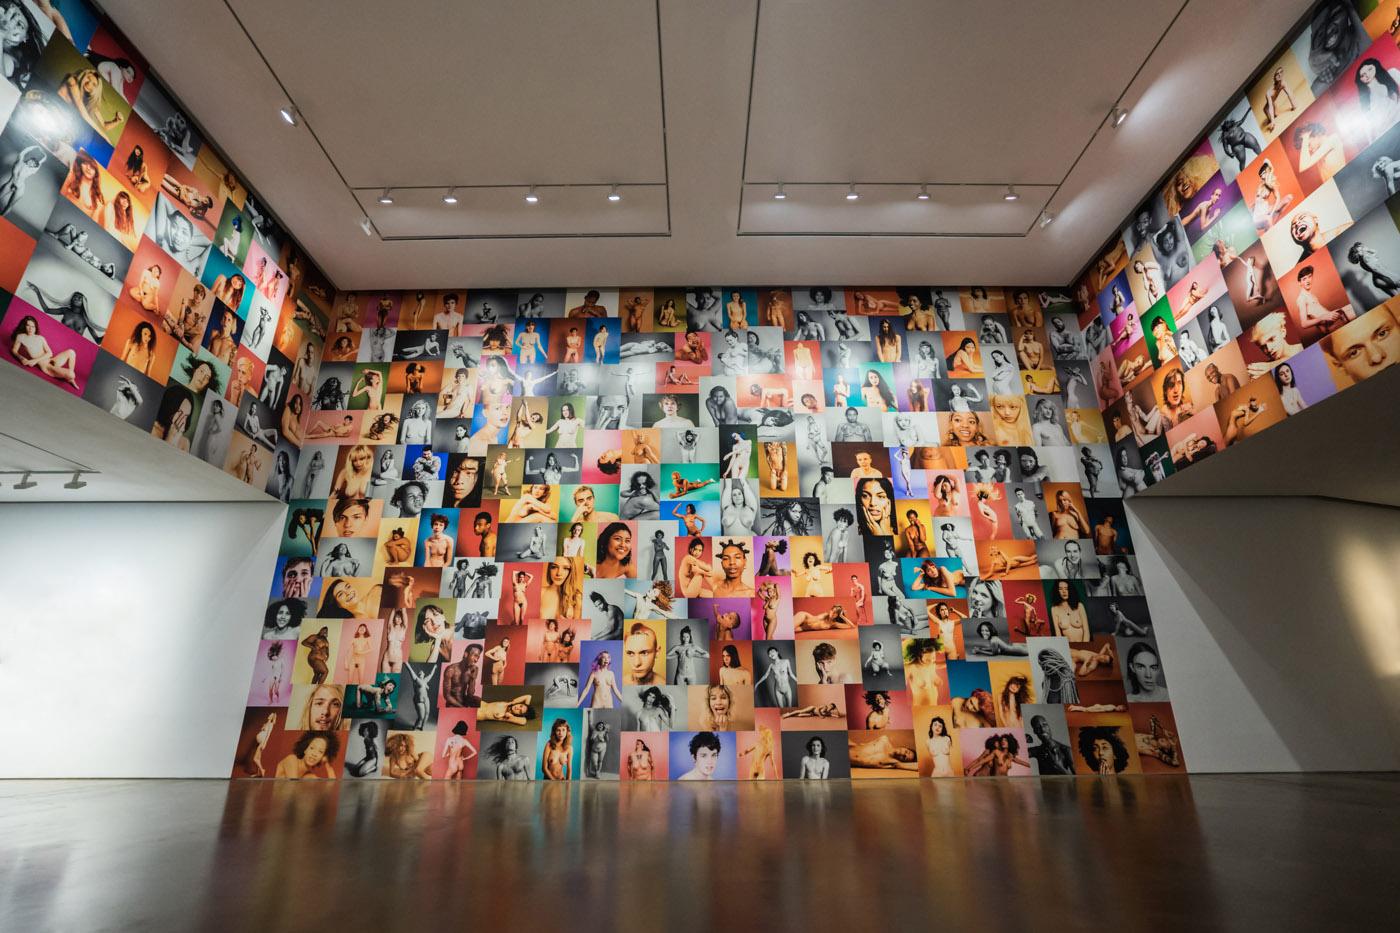 Youth, Daelim Museum, South Korea 2017